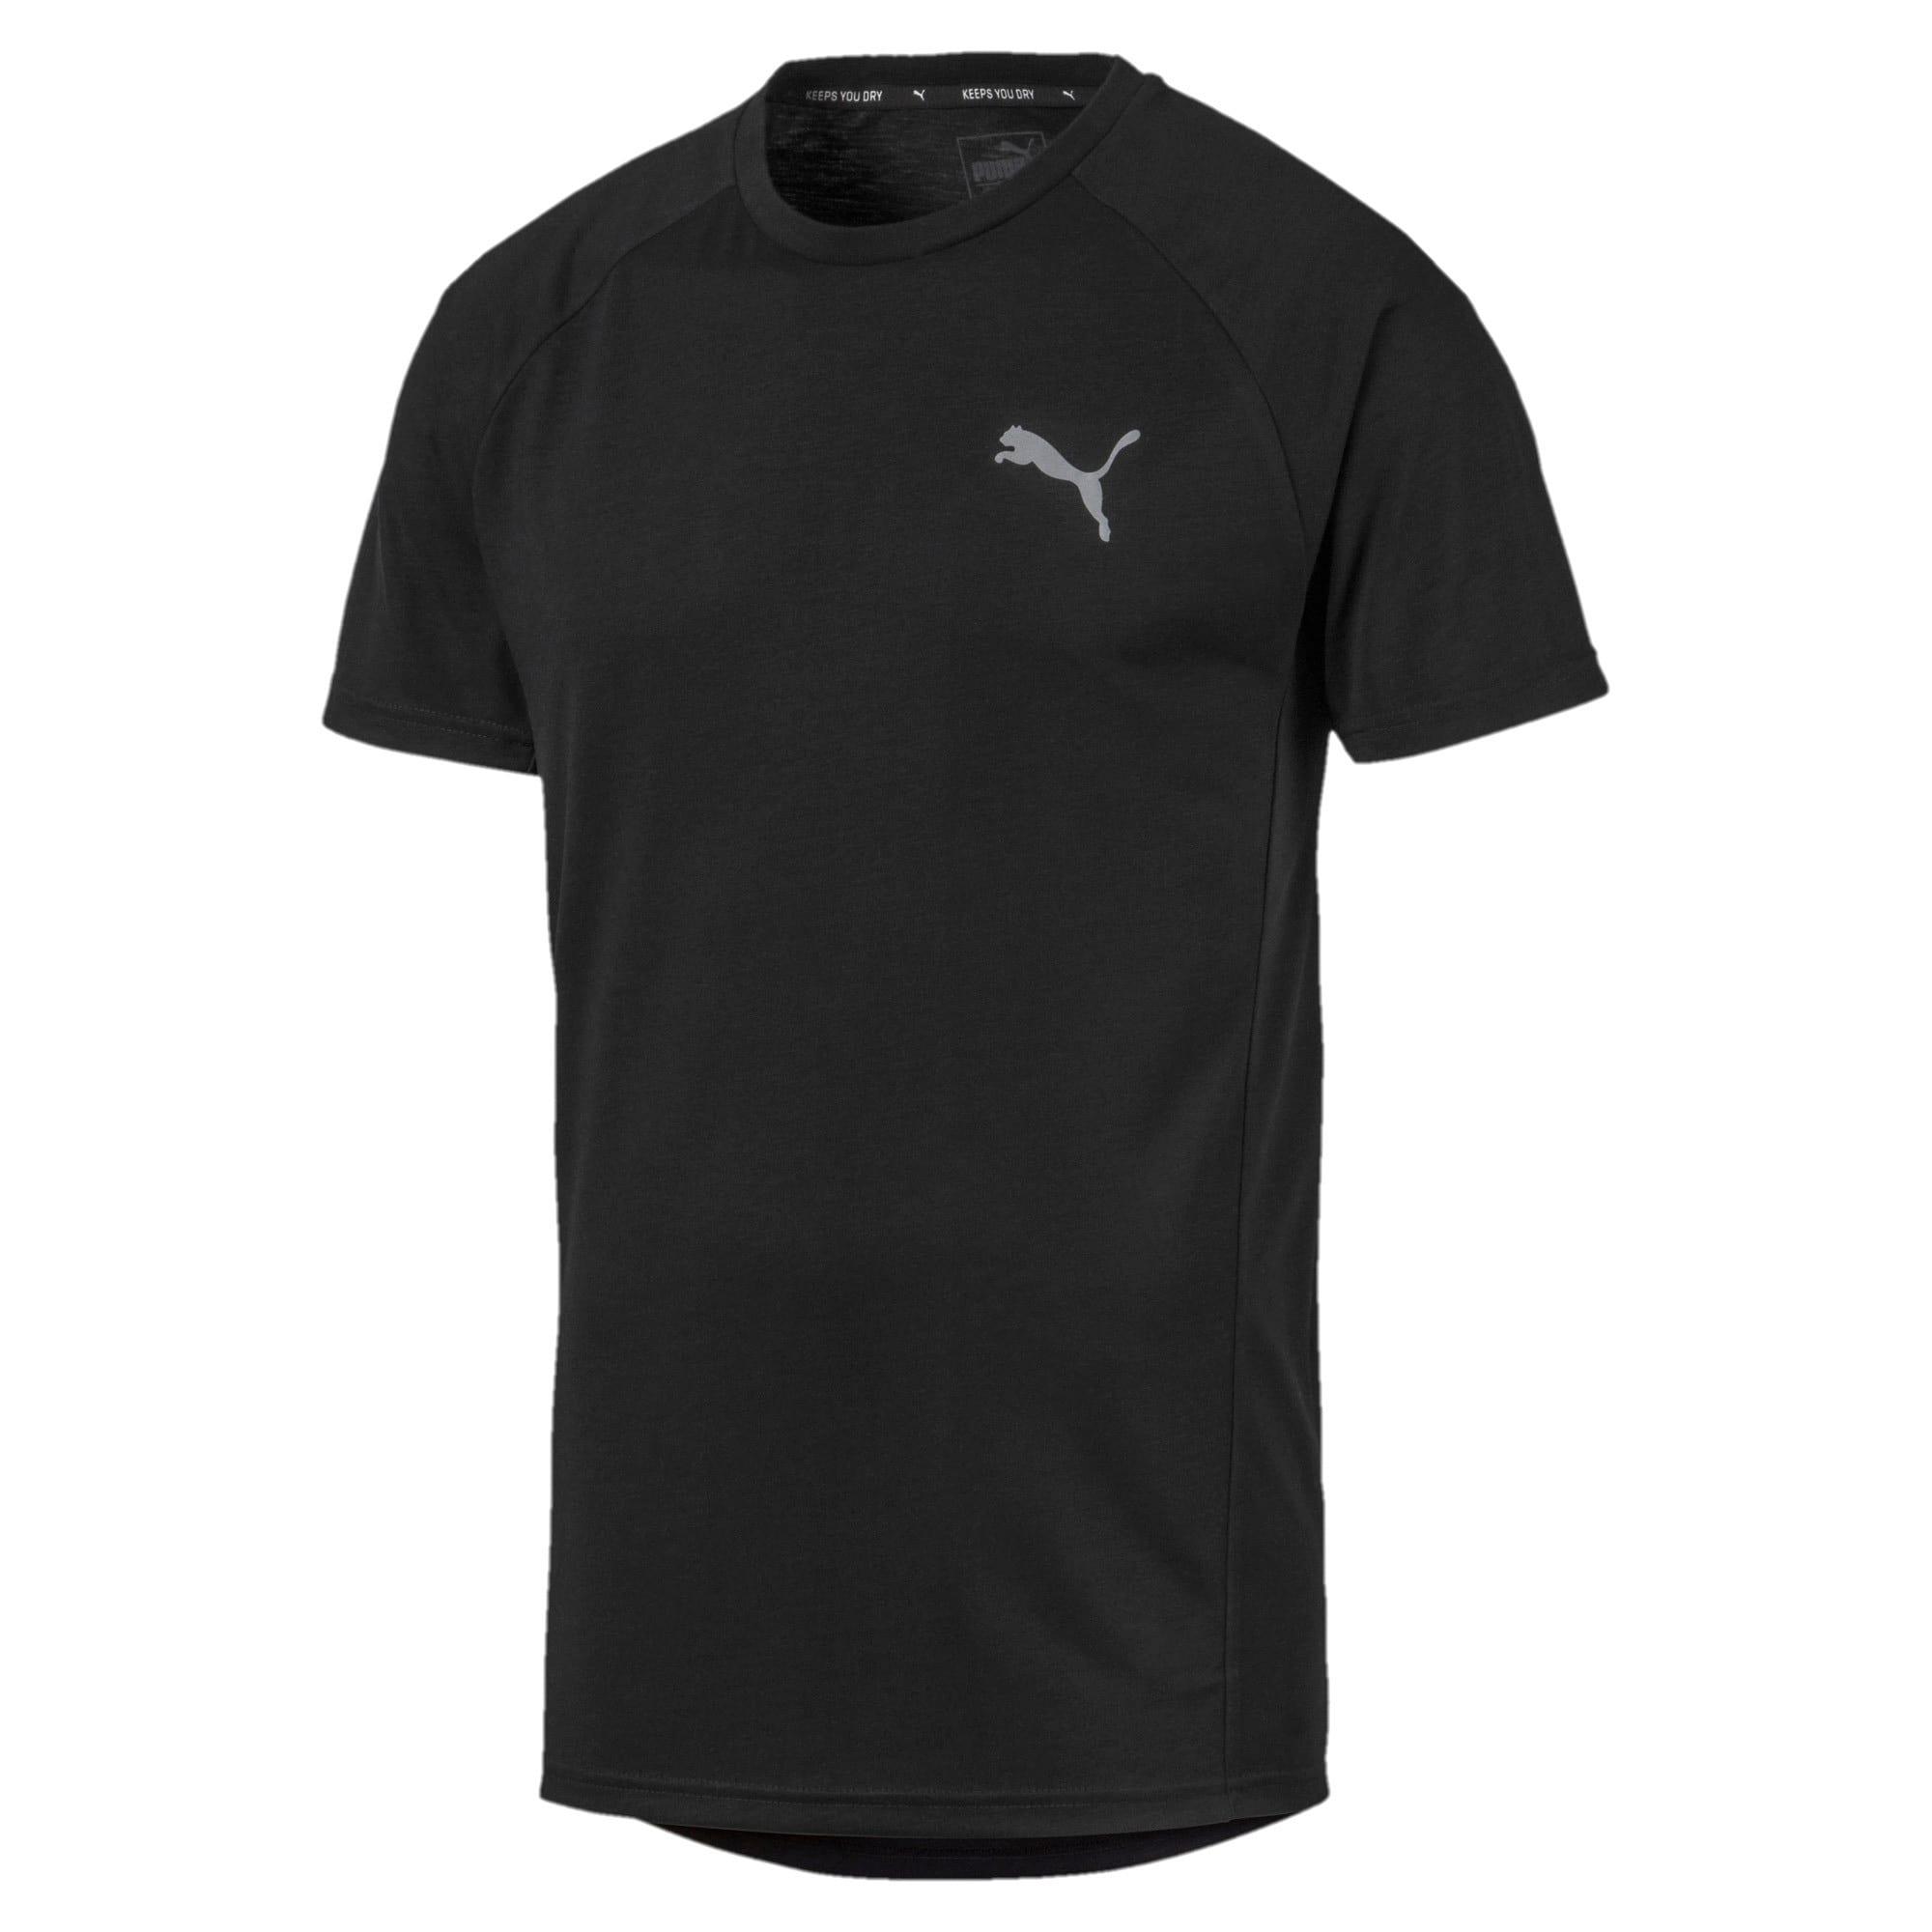 Thumbnail 4 of Meska koszulka z krótkim rekawem Evostripe, Puma Black, medium